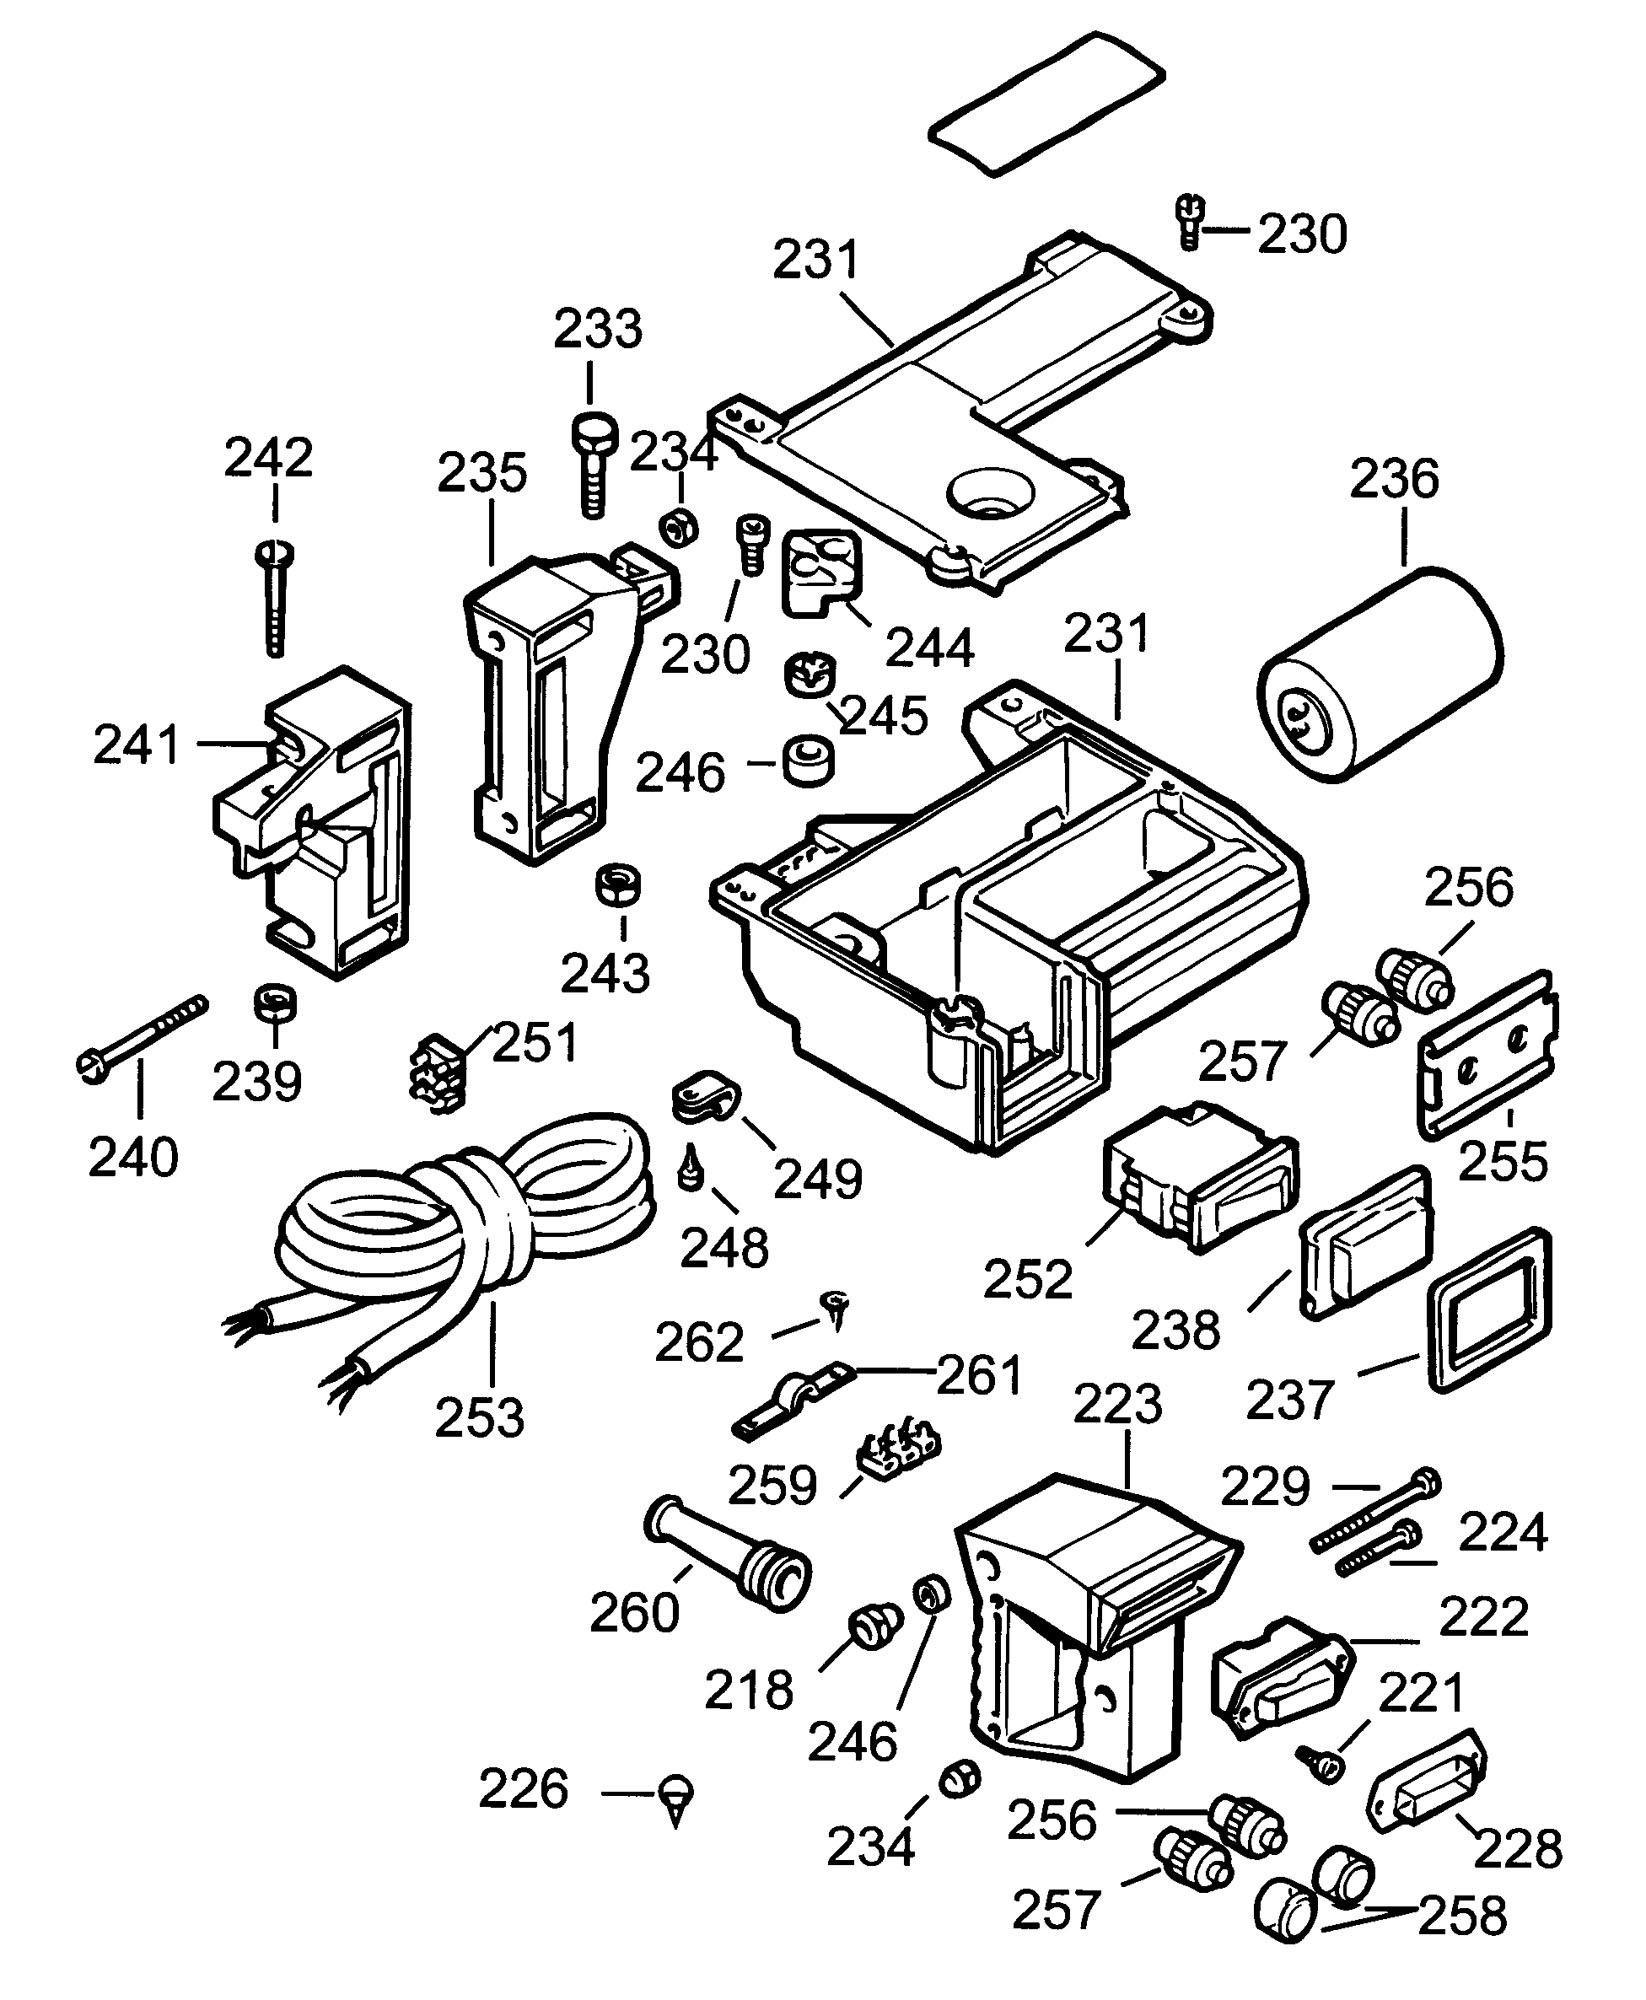 Spares for Dewalt Dw1251 Radial Arm Saw (type 1) SPARE